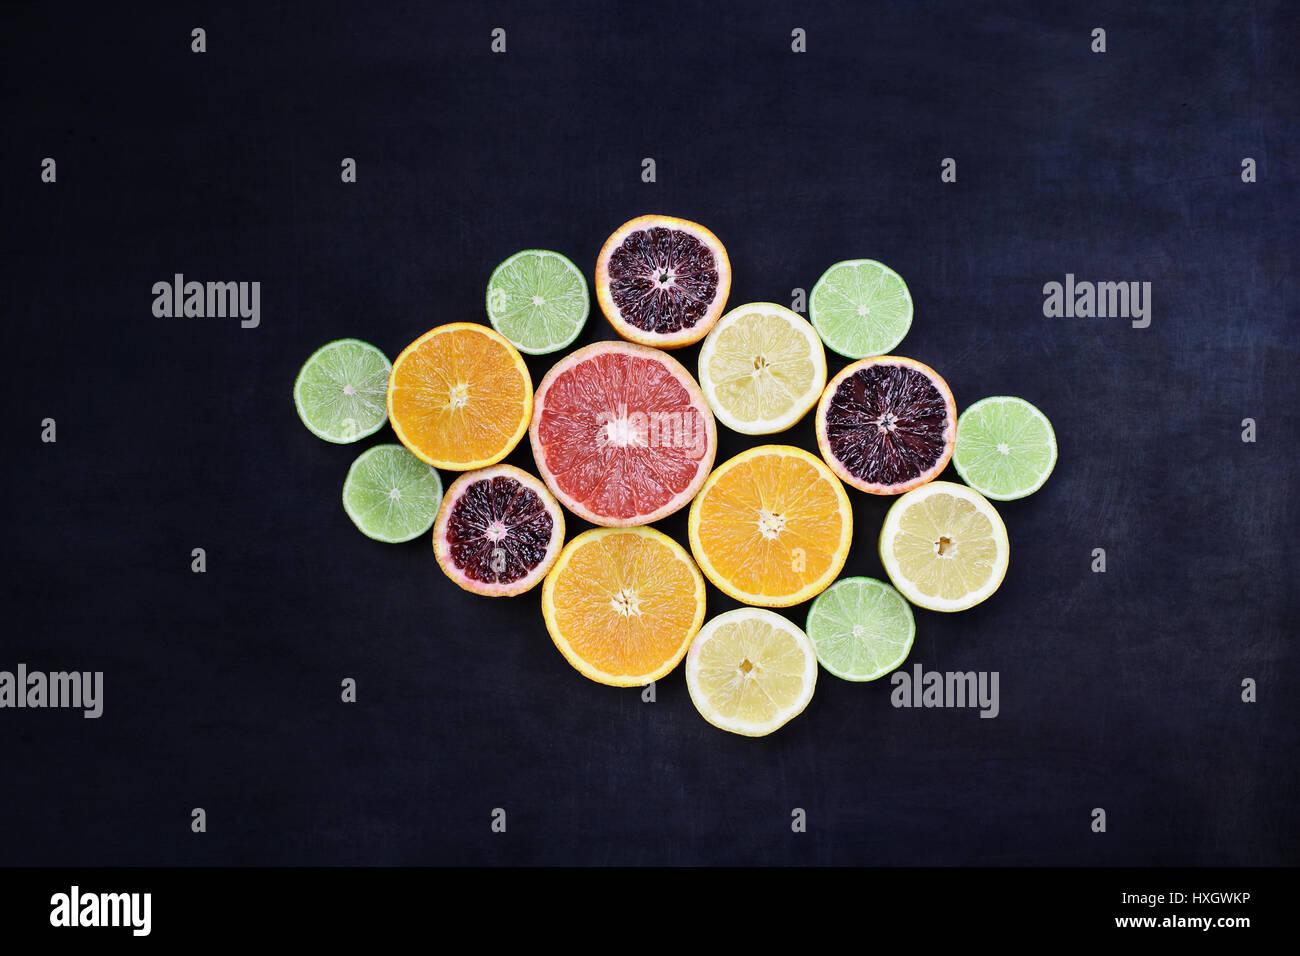 Variety of citrus fruits (orange, blood oranges, lemons, grapefruits, and limes) over a black rustic background. - Stock Image